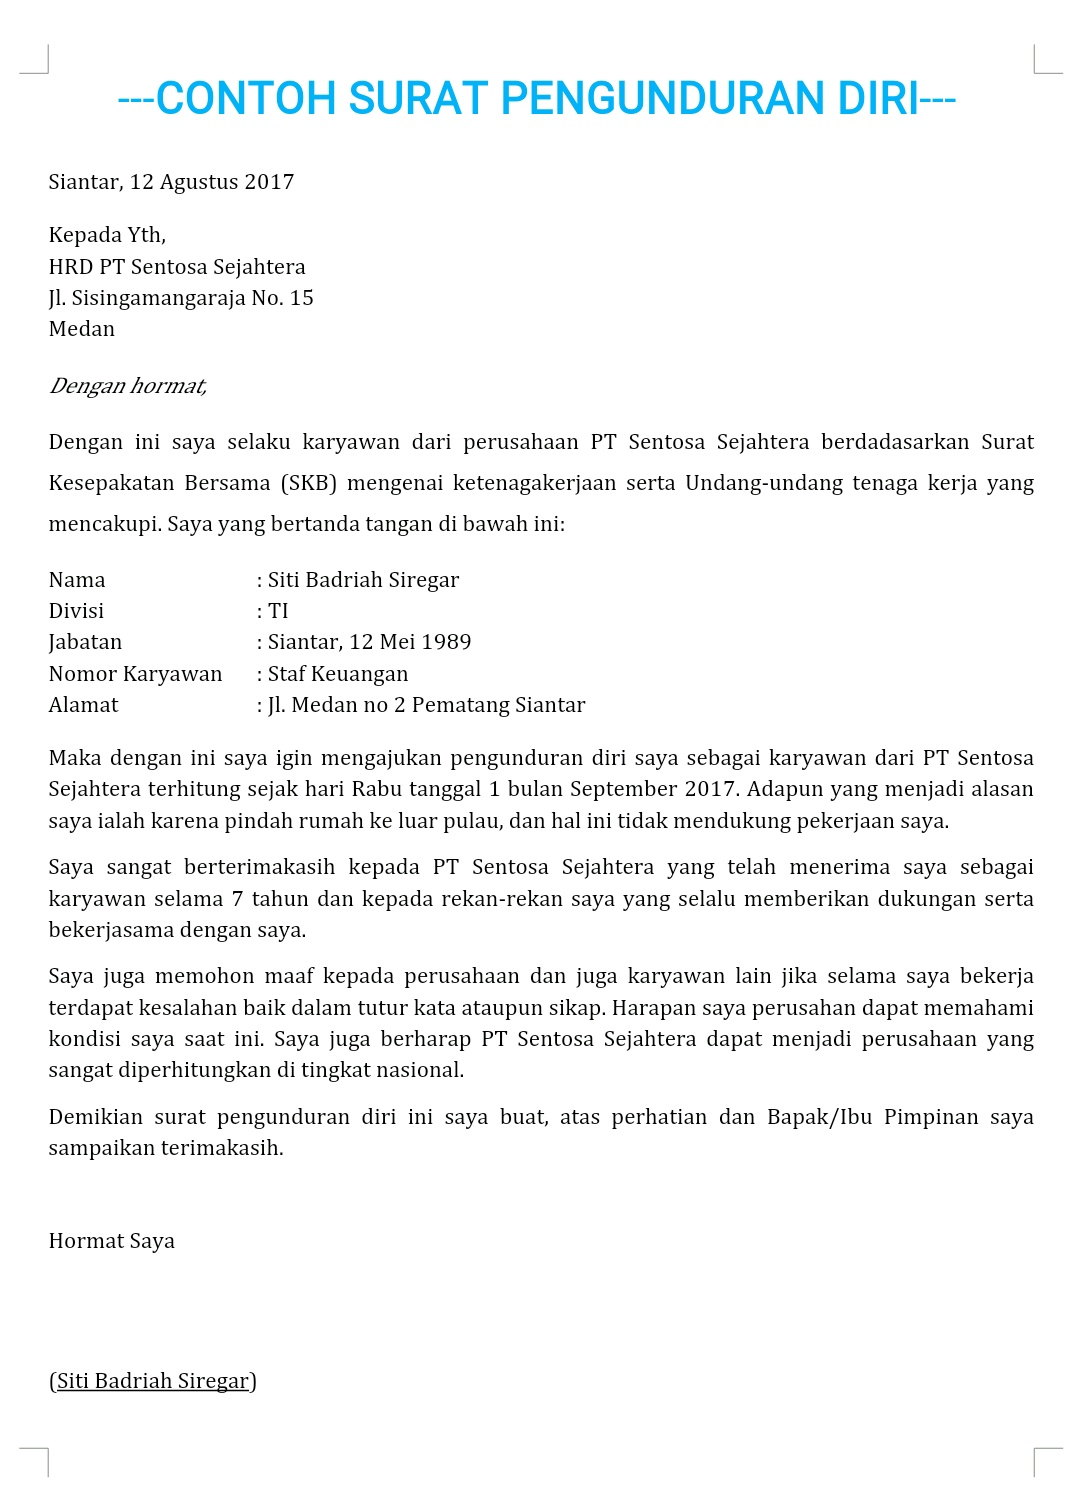 Cara Membuat Surat Pengunduran Diri Suka Bahasa Indonesia